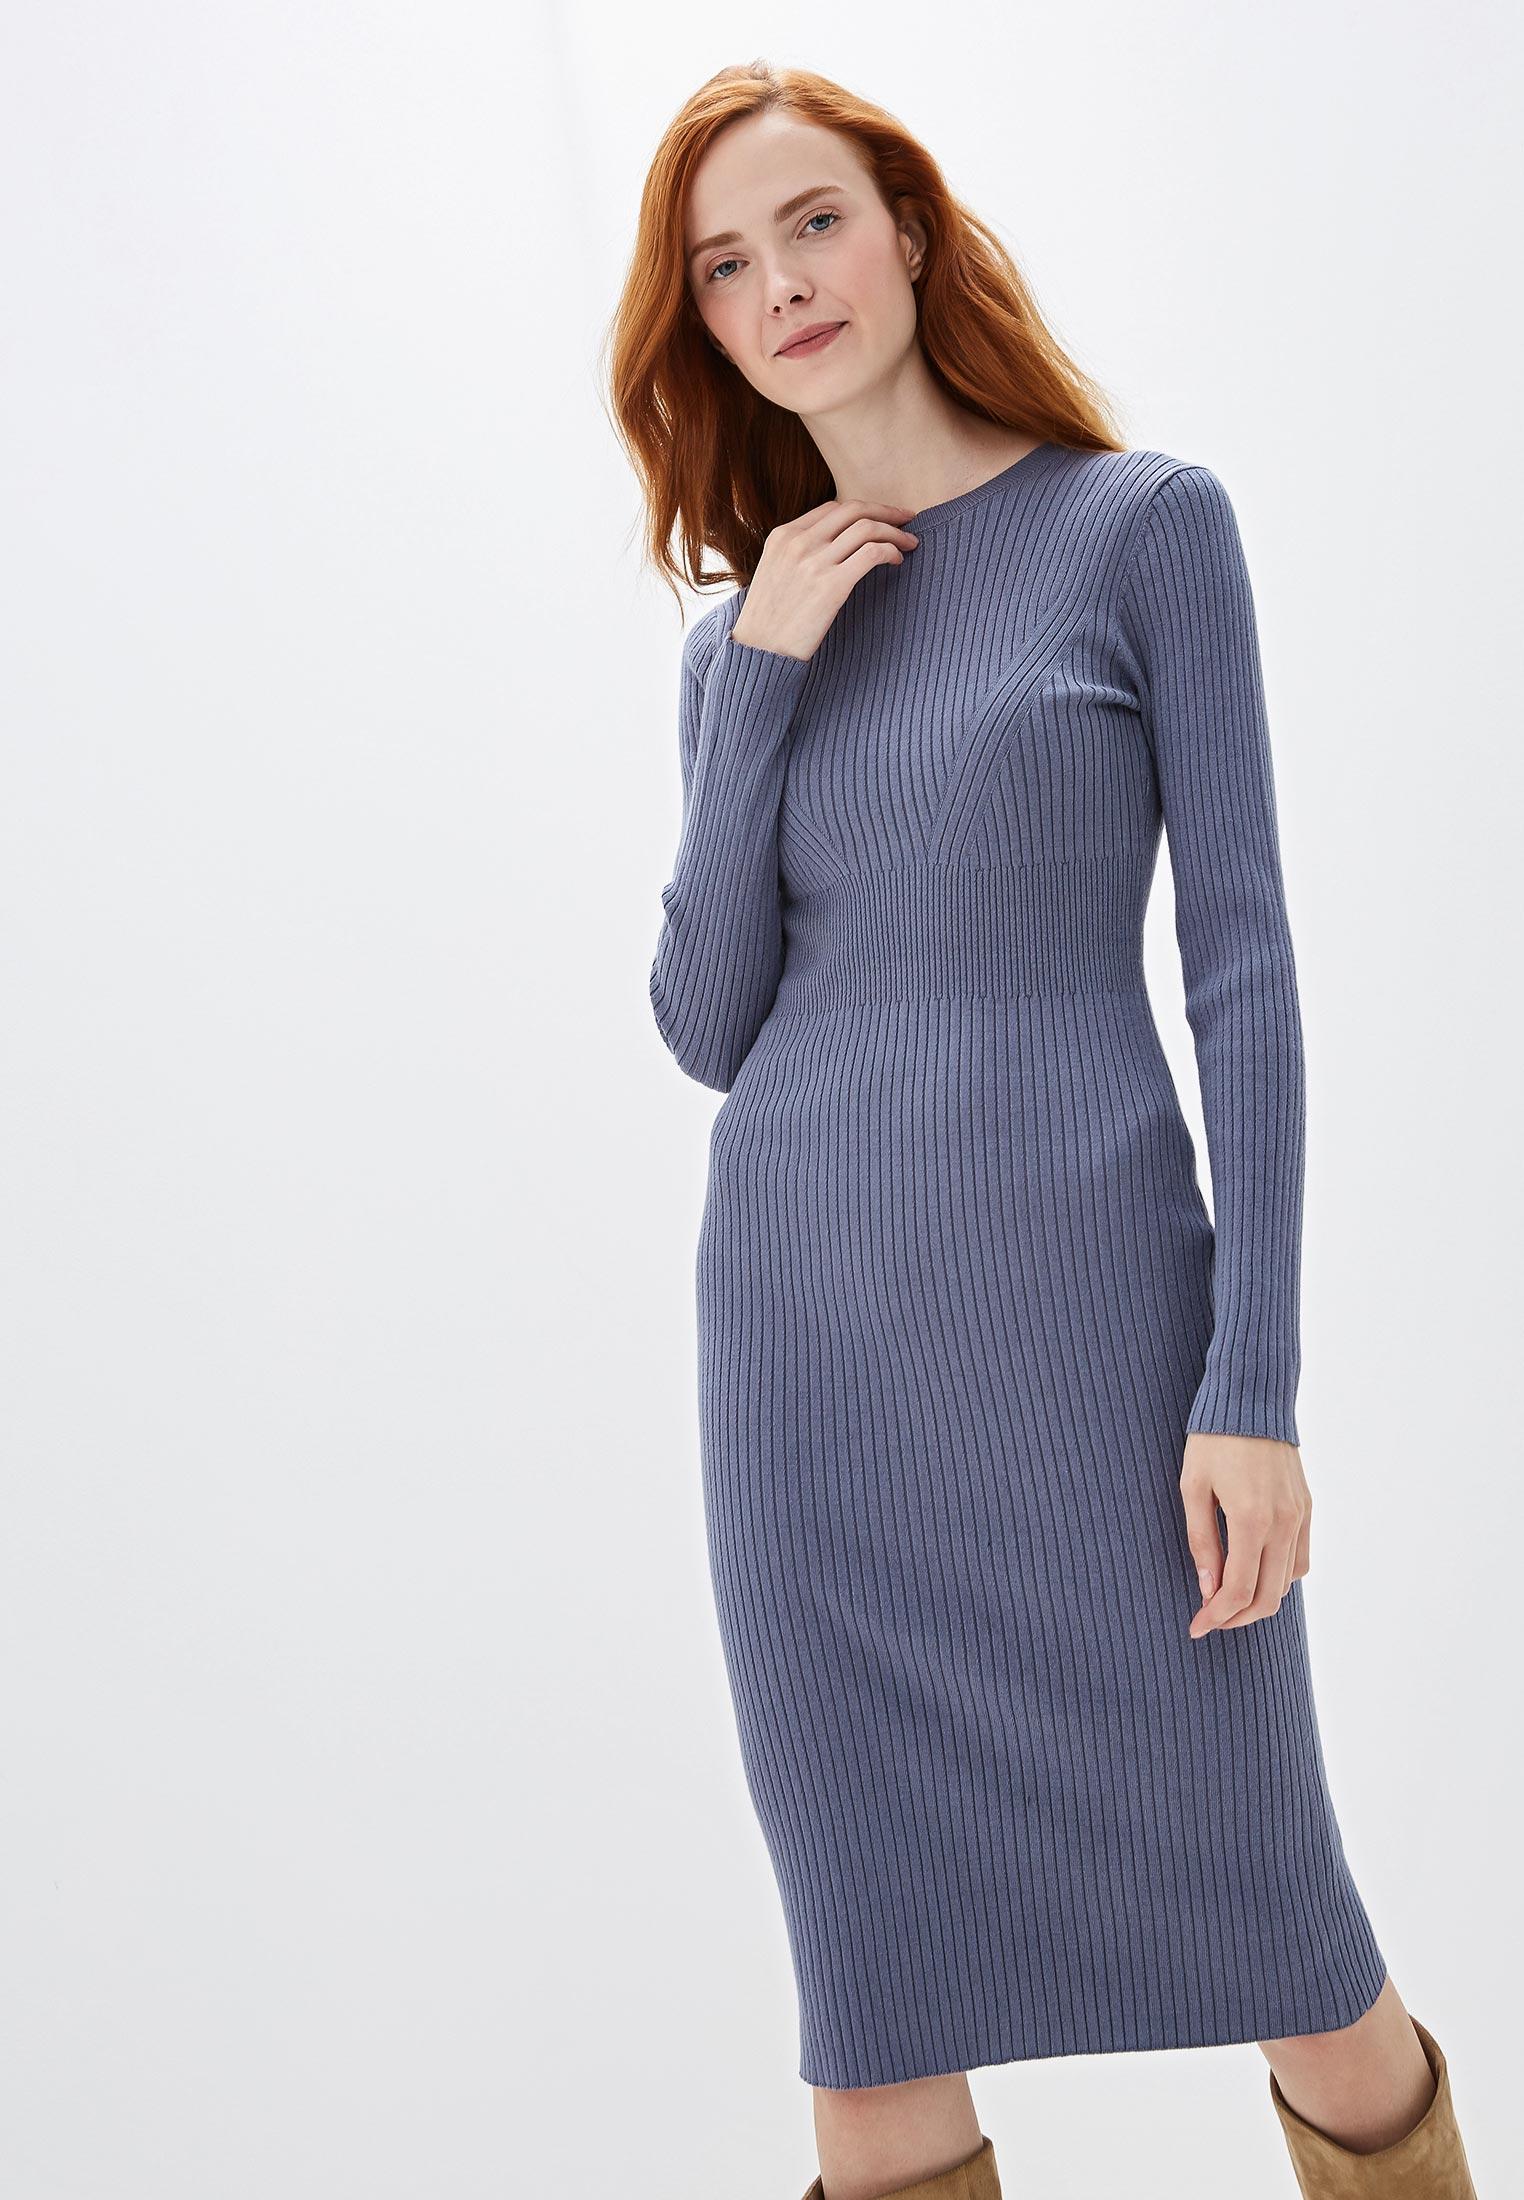 Вязаное платье Sela (Сэла) DSw-117/1272-9442